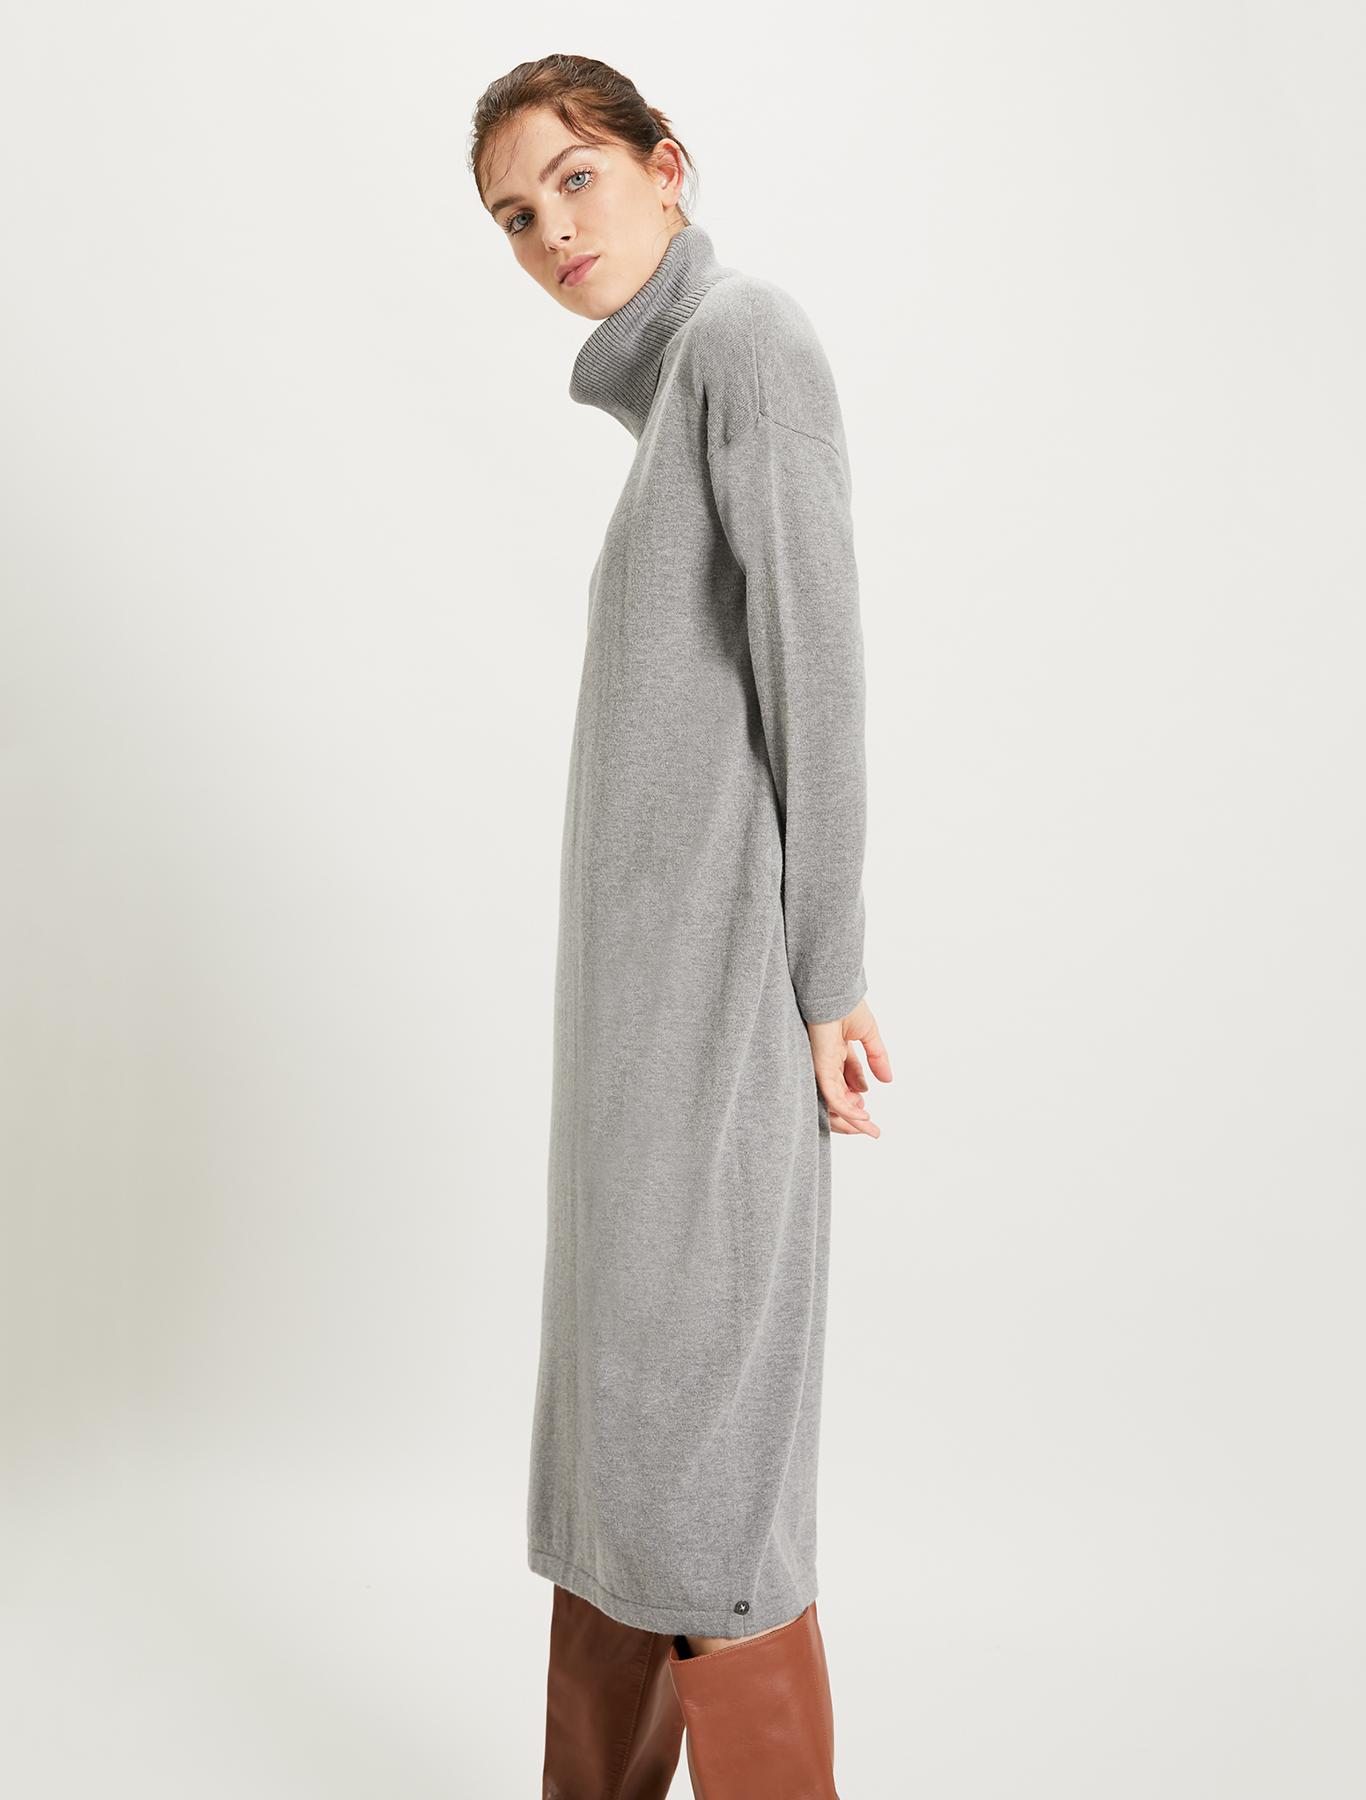 Knit pencil dress - medium grey - pennyblack